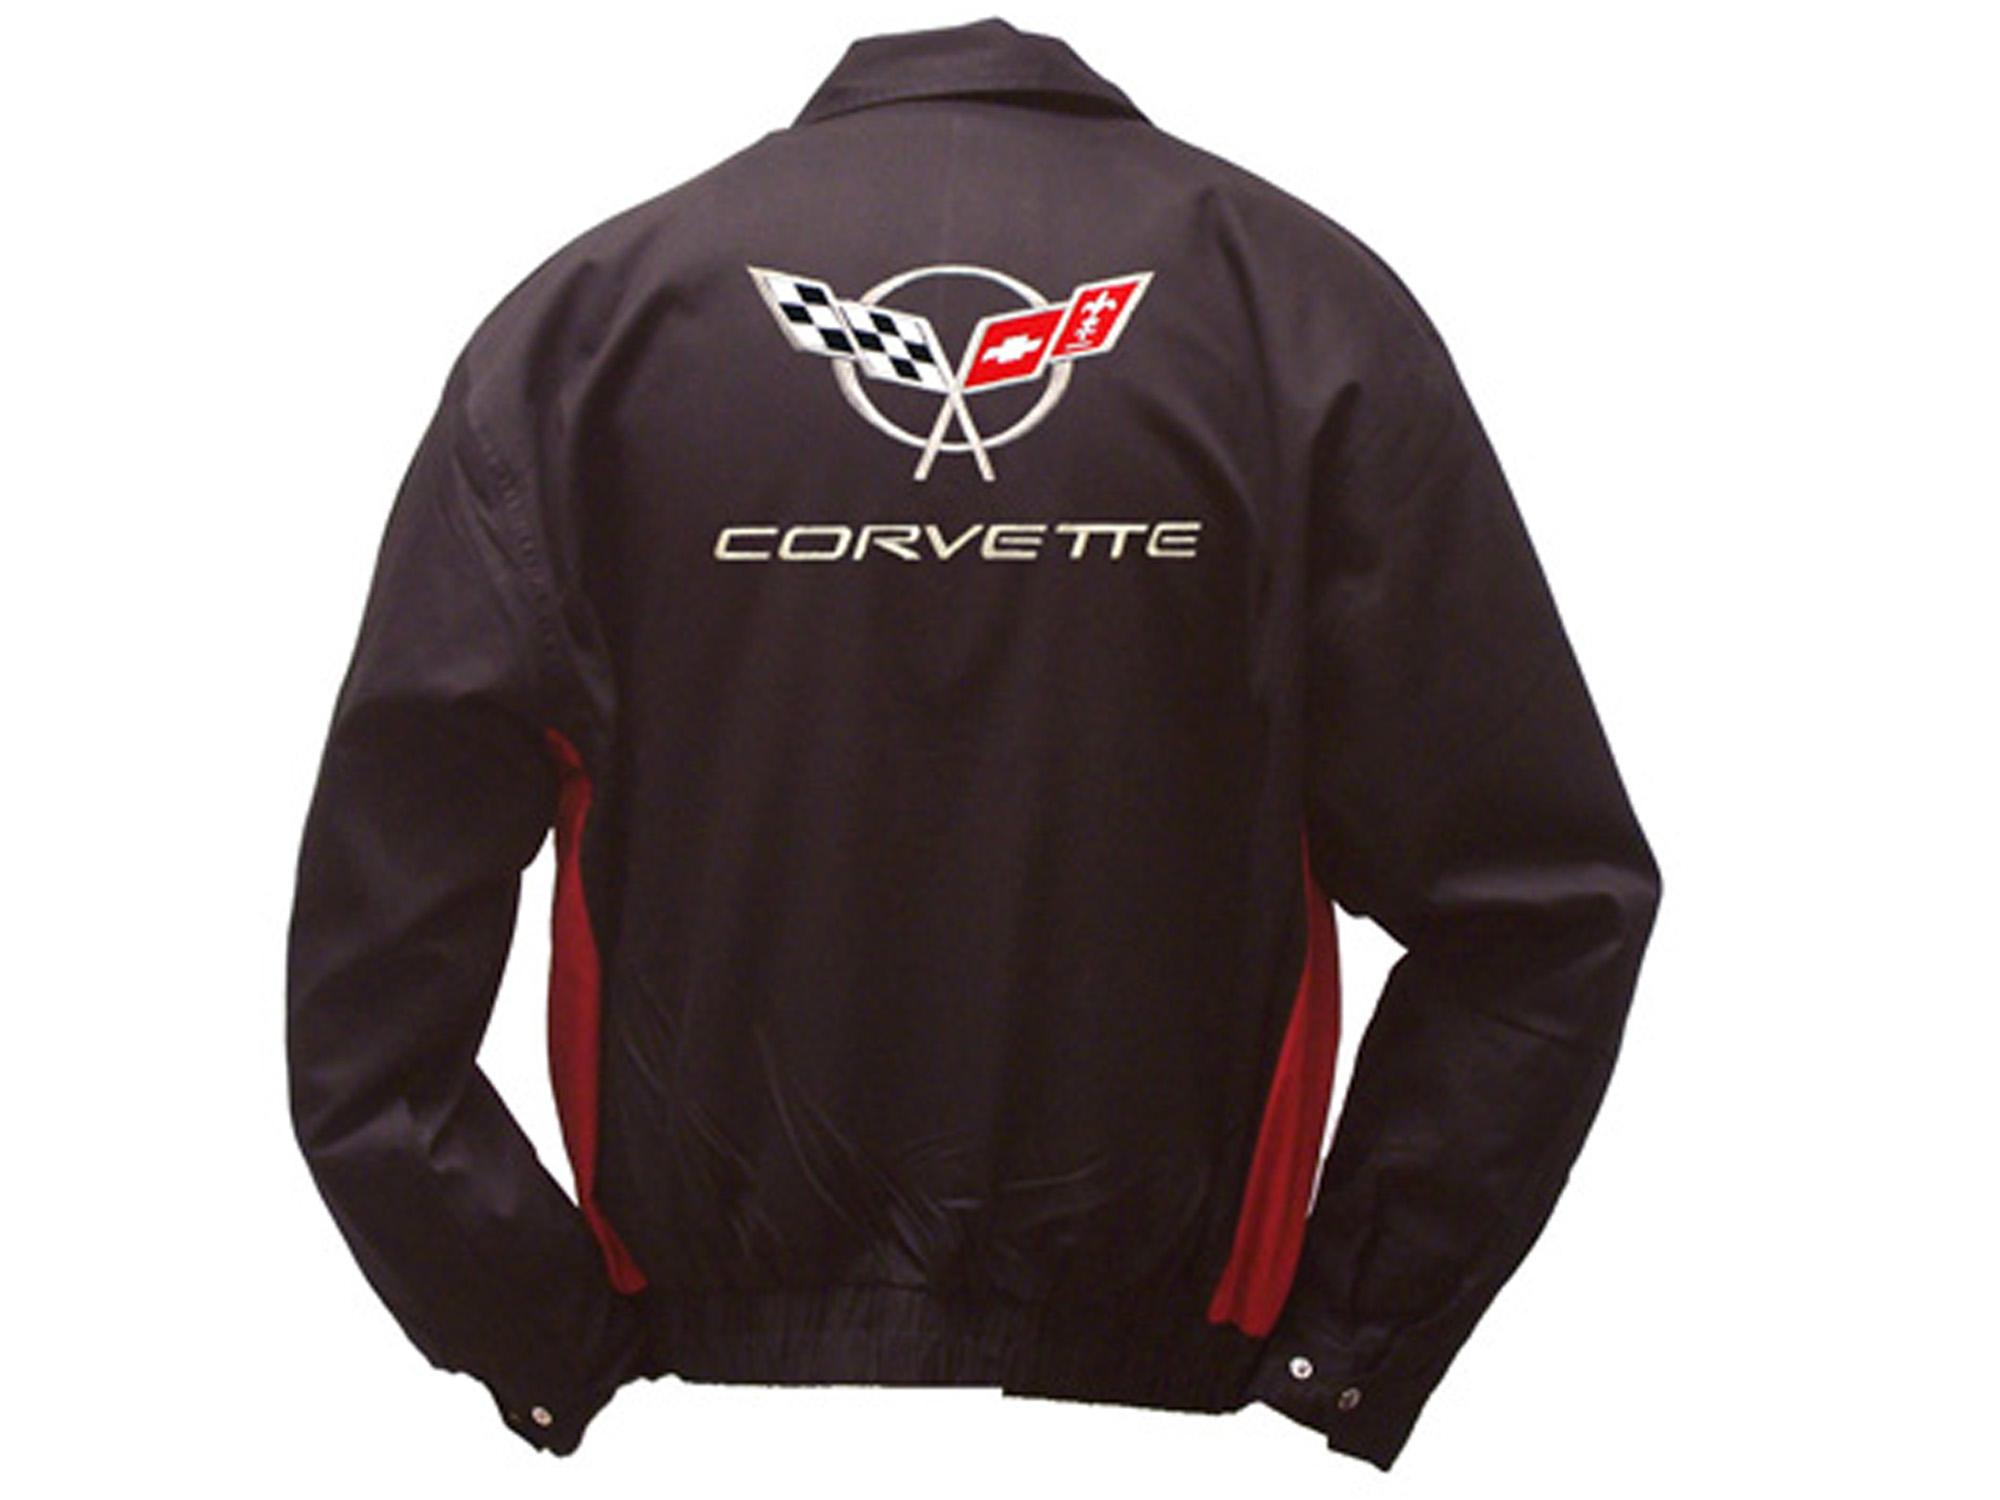 1997-2004-Corvette-Jacket-C5-Emblem-Black-Red-Twill